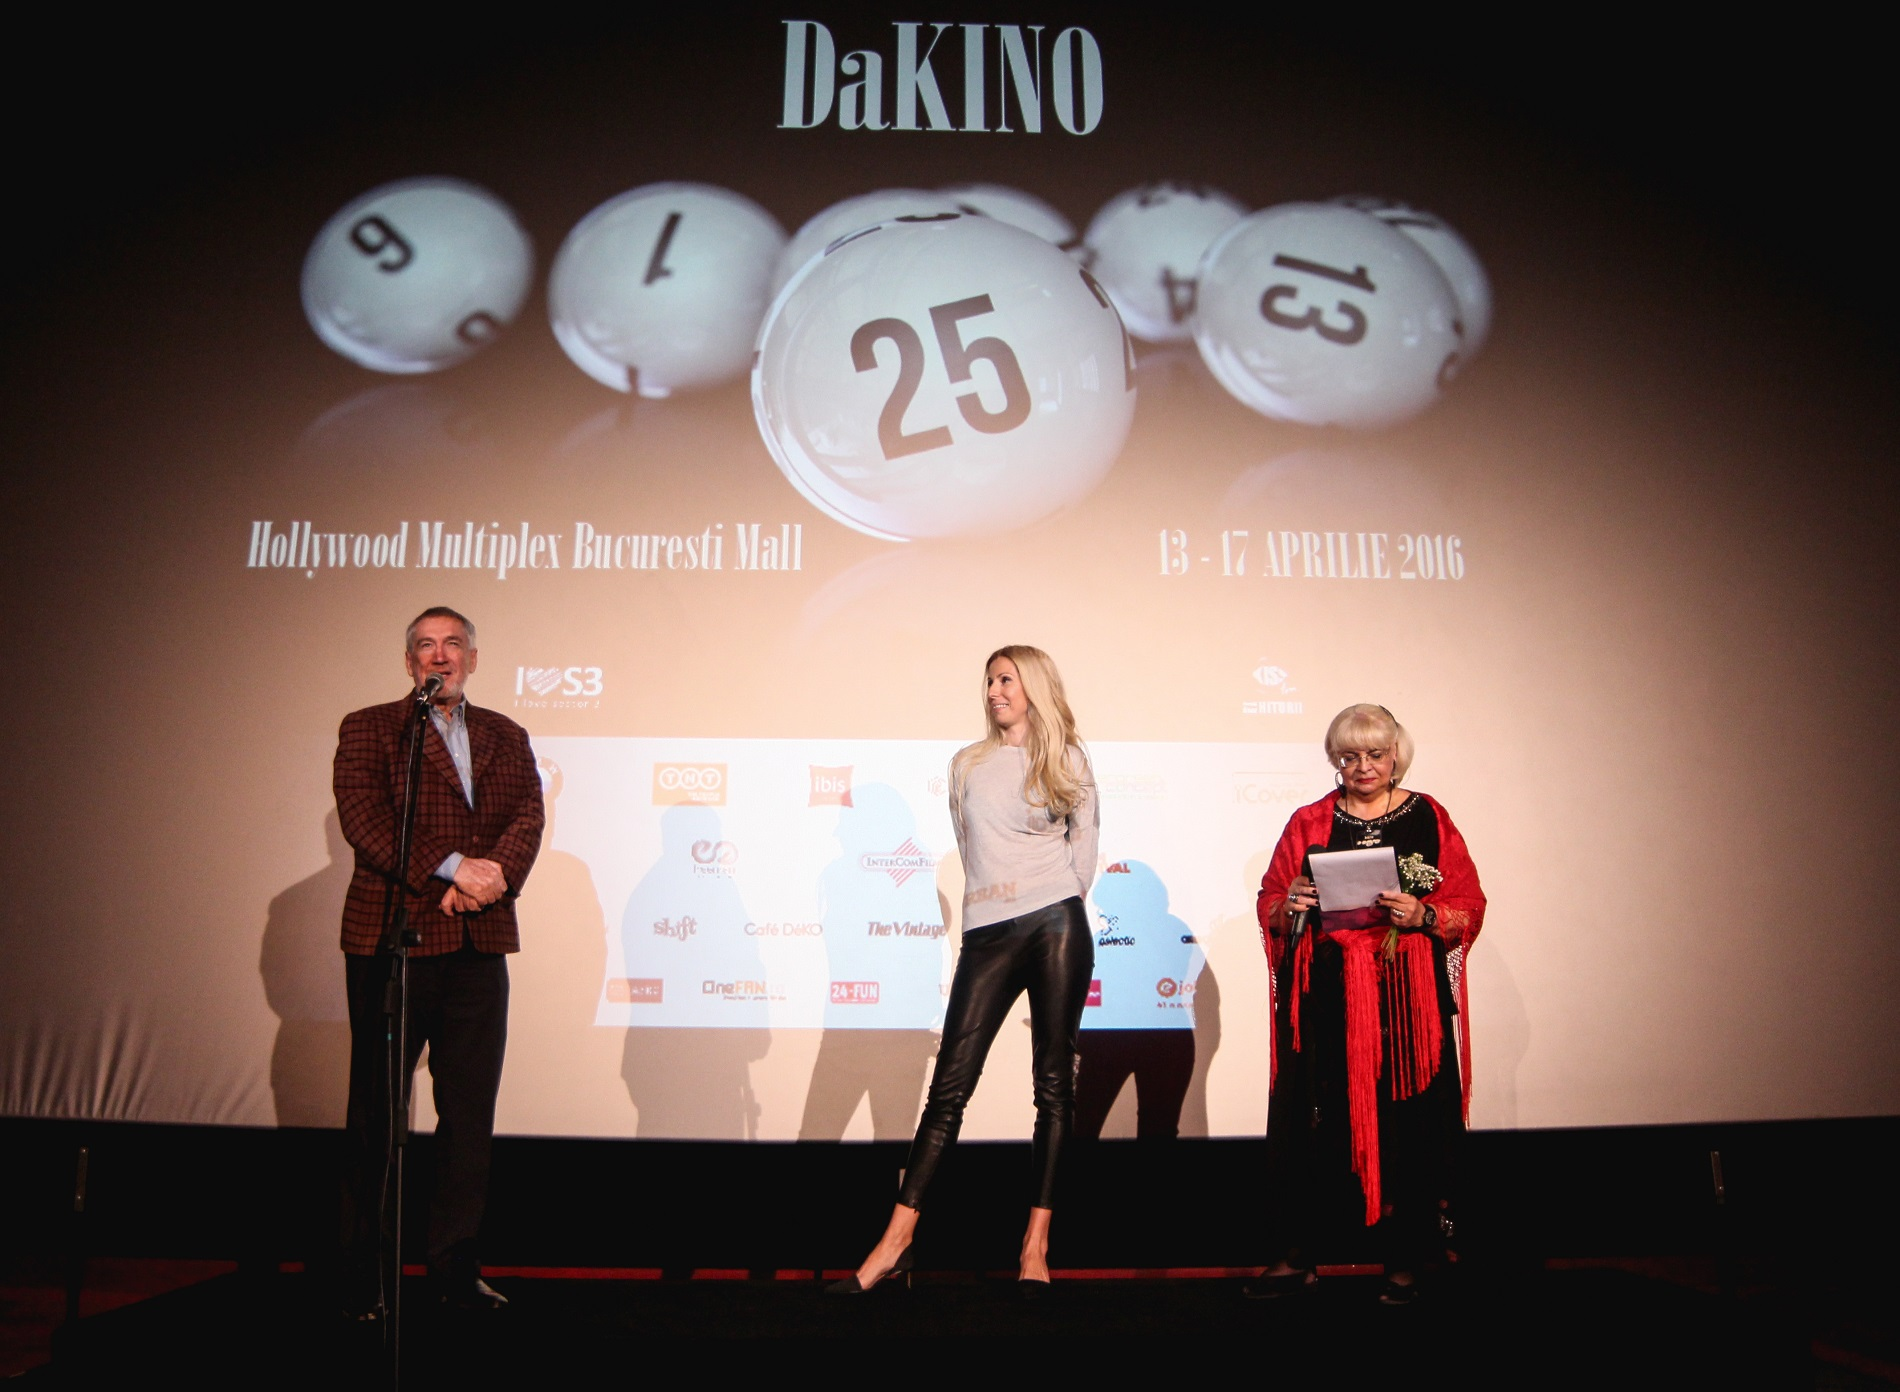 Gala de Deschidere DaKINO 25_13.04.2016